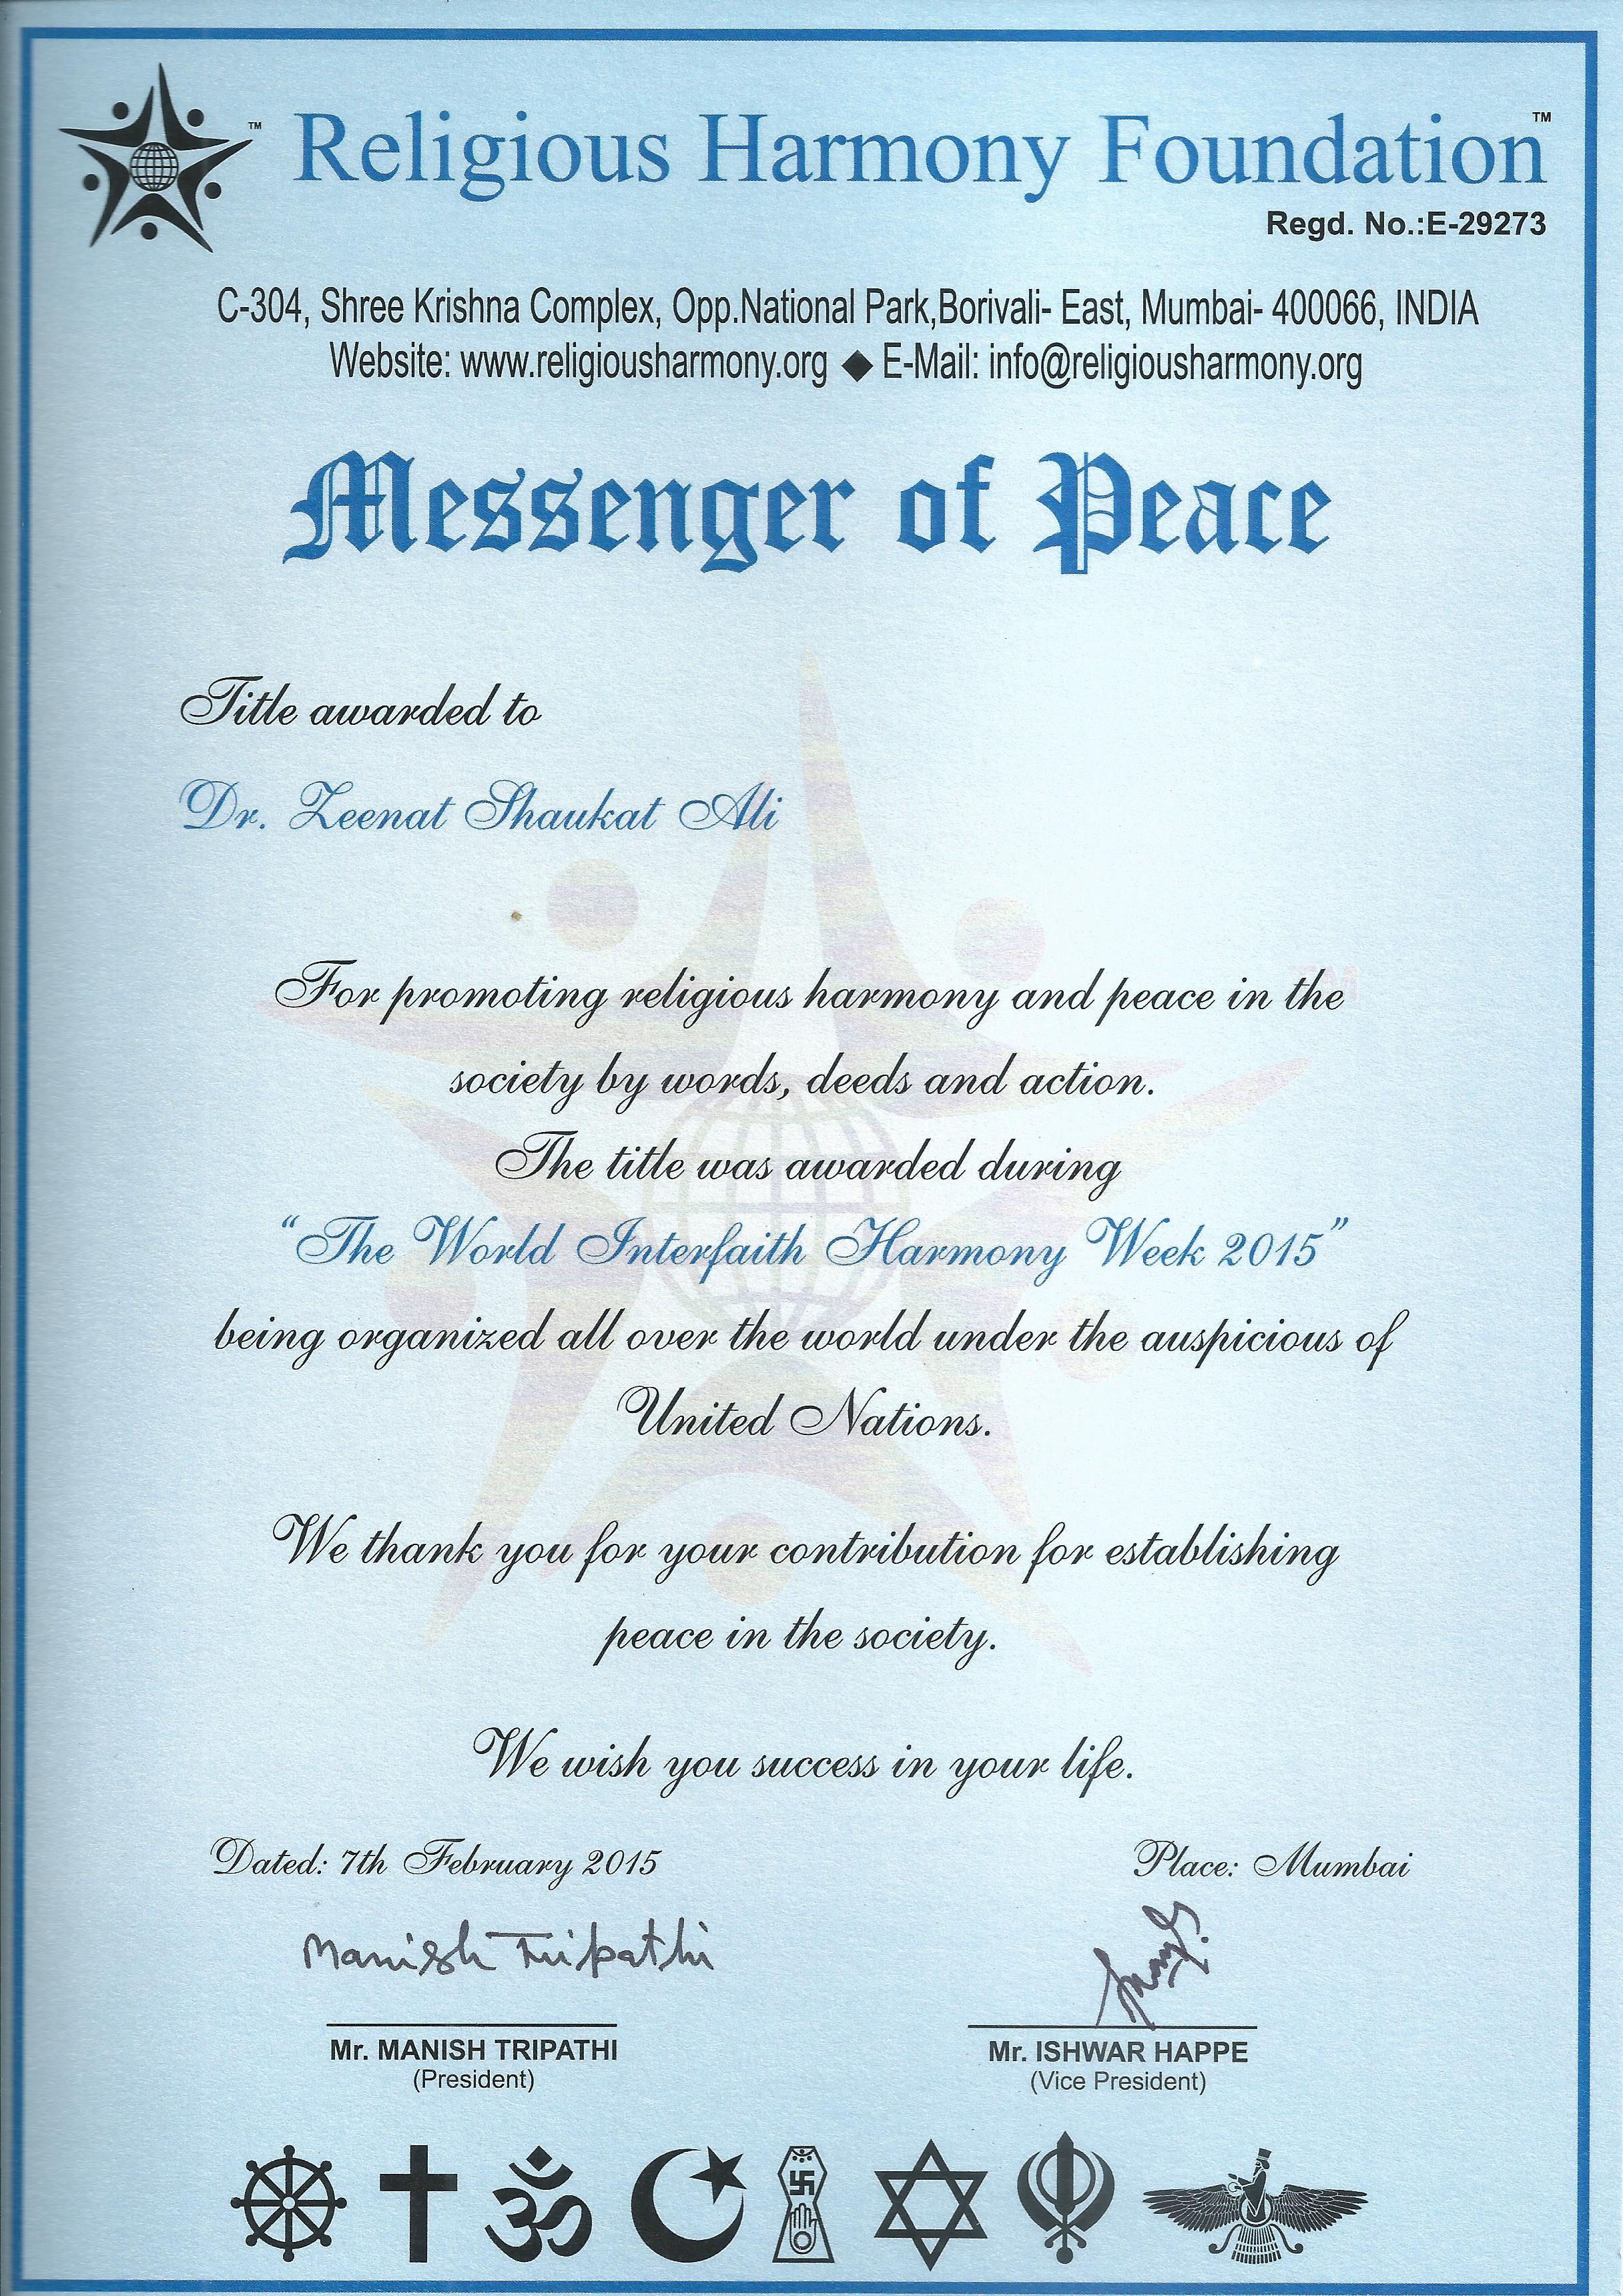 Dr.-Zeenat-Shaukat-Ali-Messenger-Of-Peace-Religious-Harmony-Foundation-Mumbai.jpg